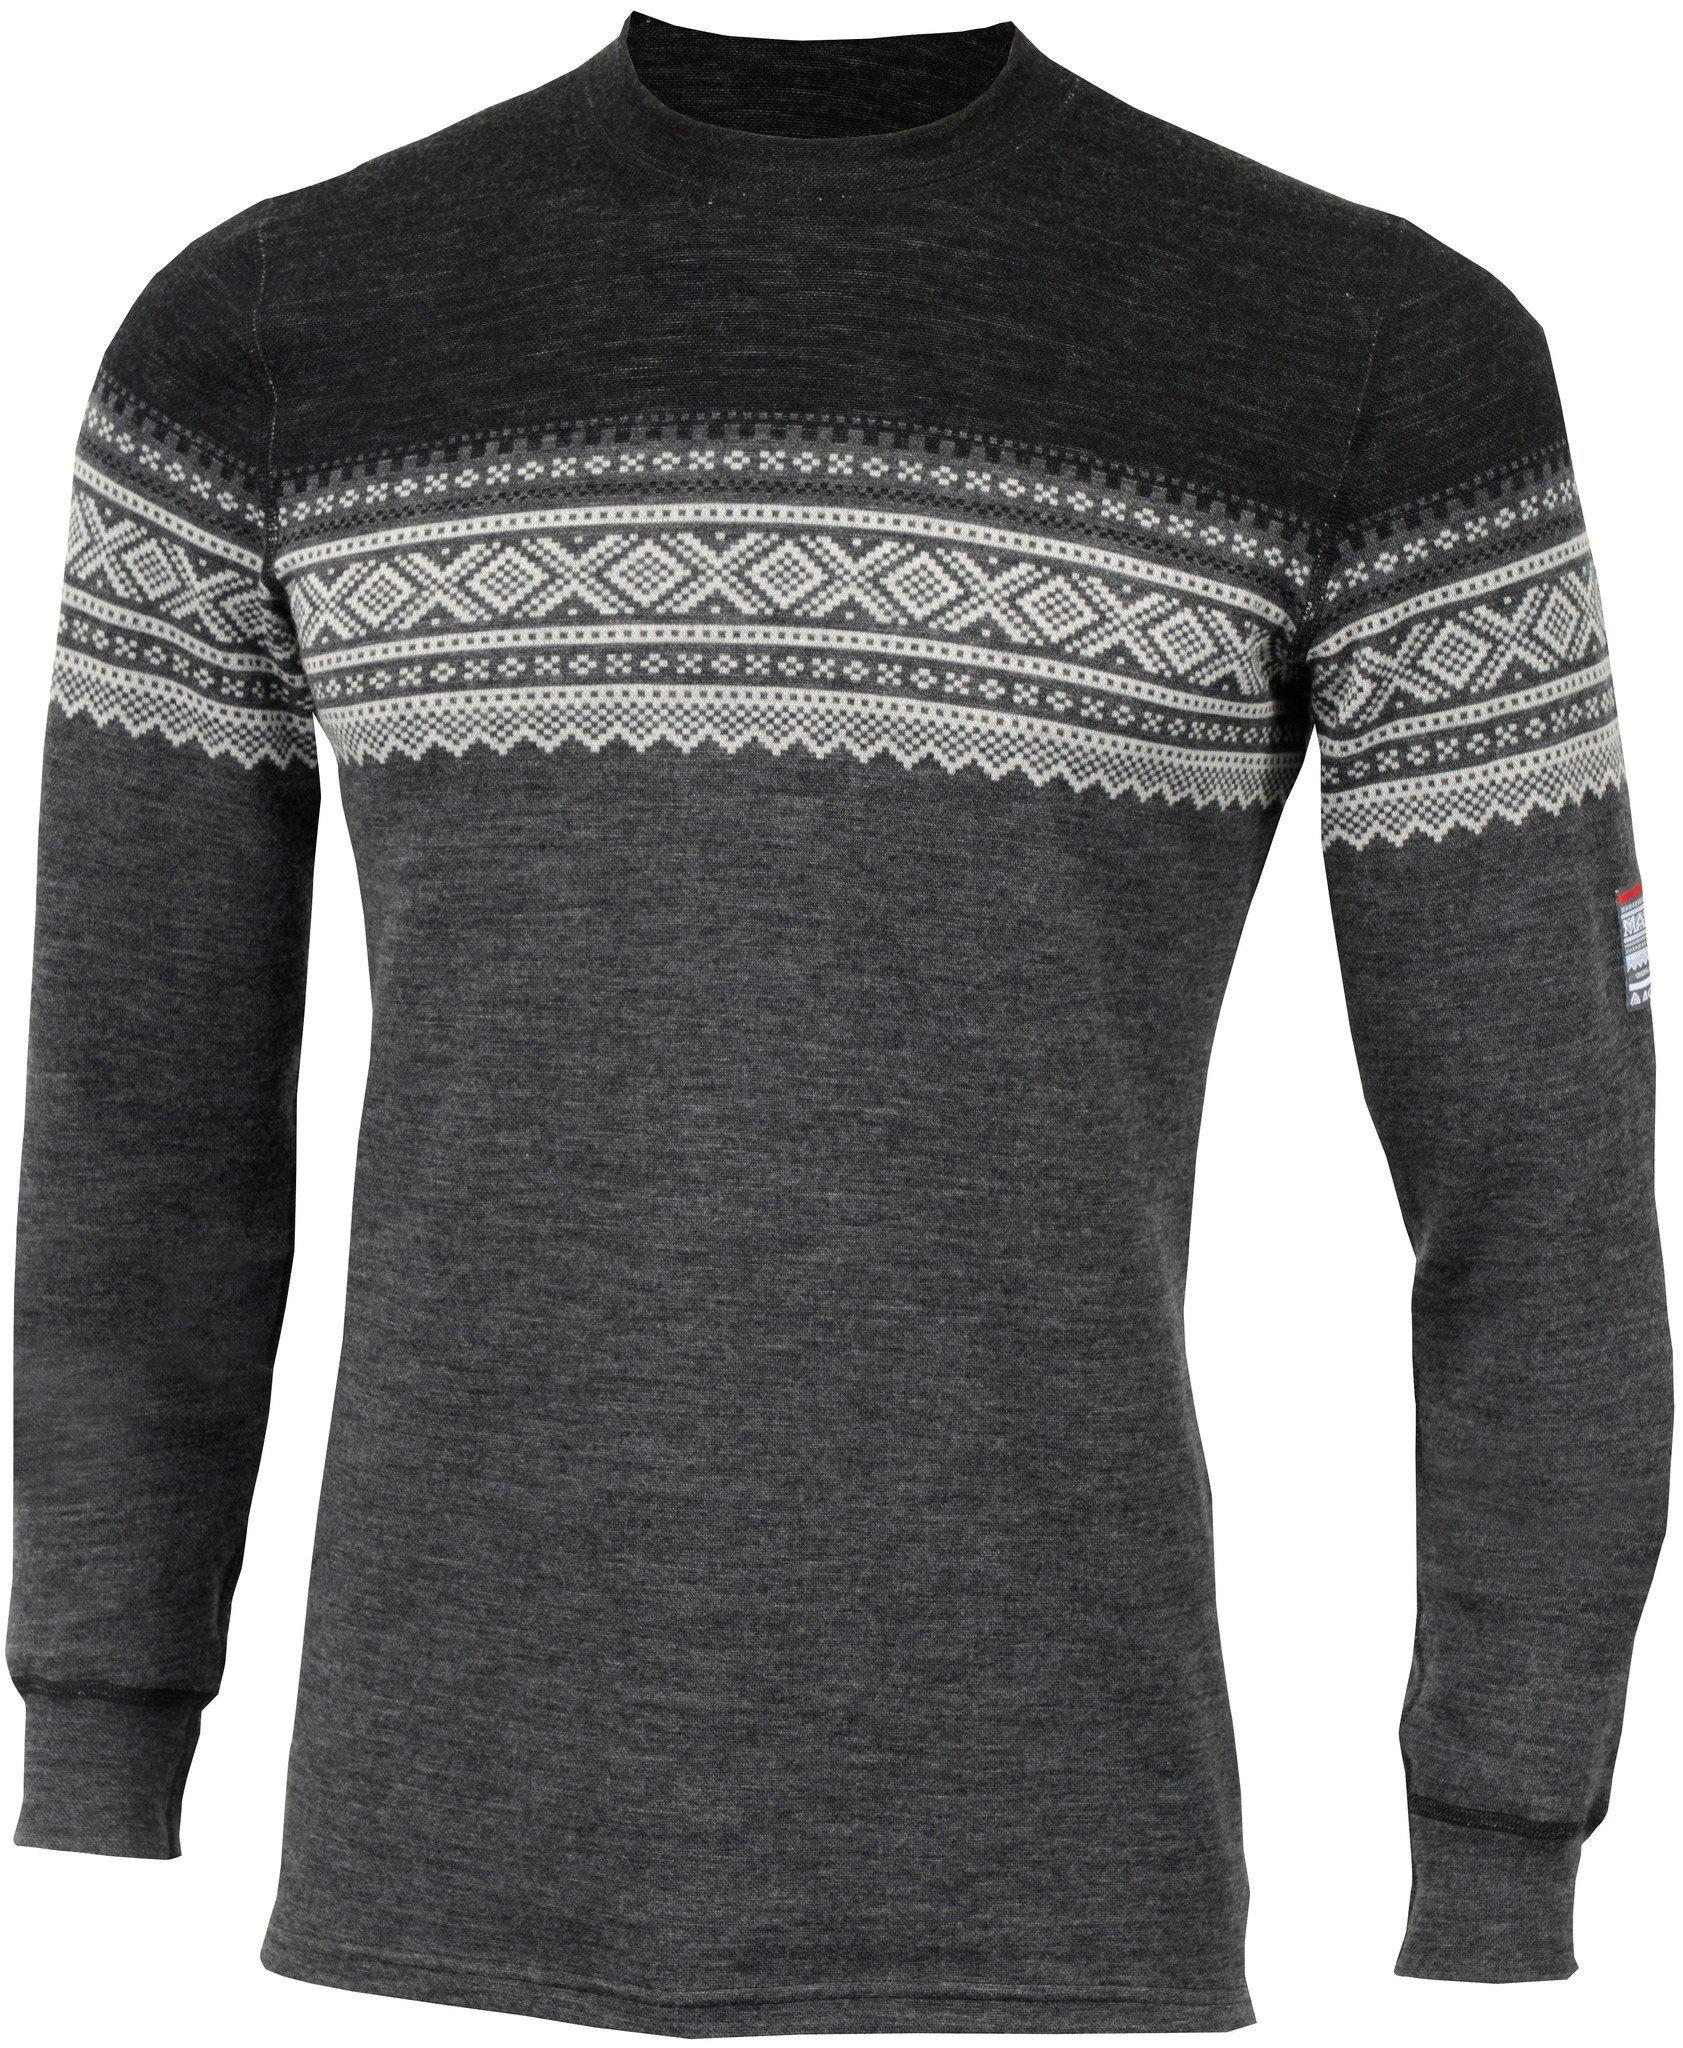 aclima sweatshirt designwool marius crew neck shirt men - Jacquard Muster